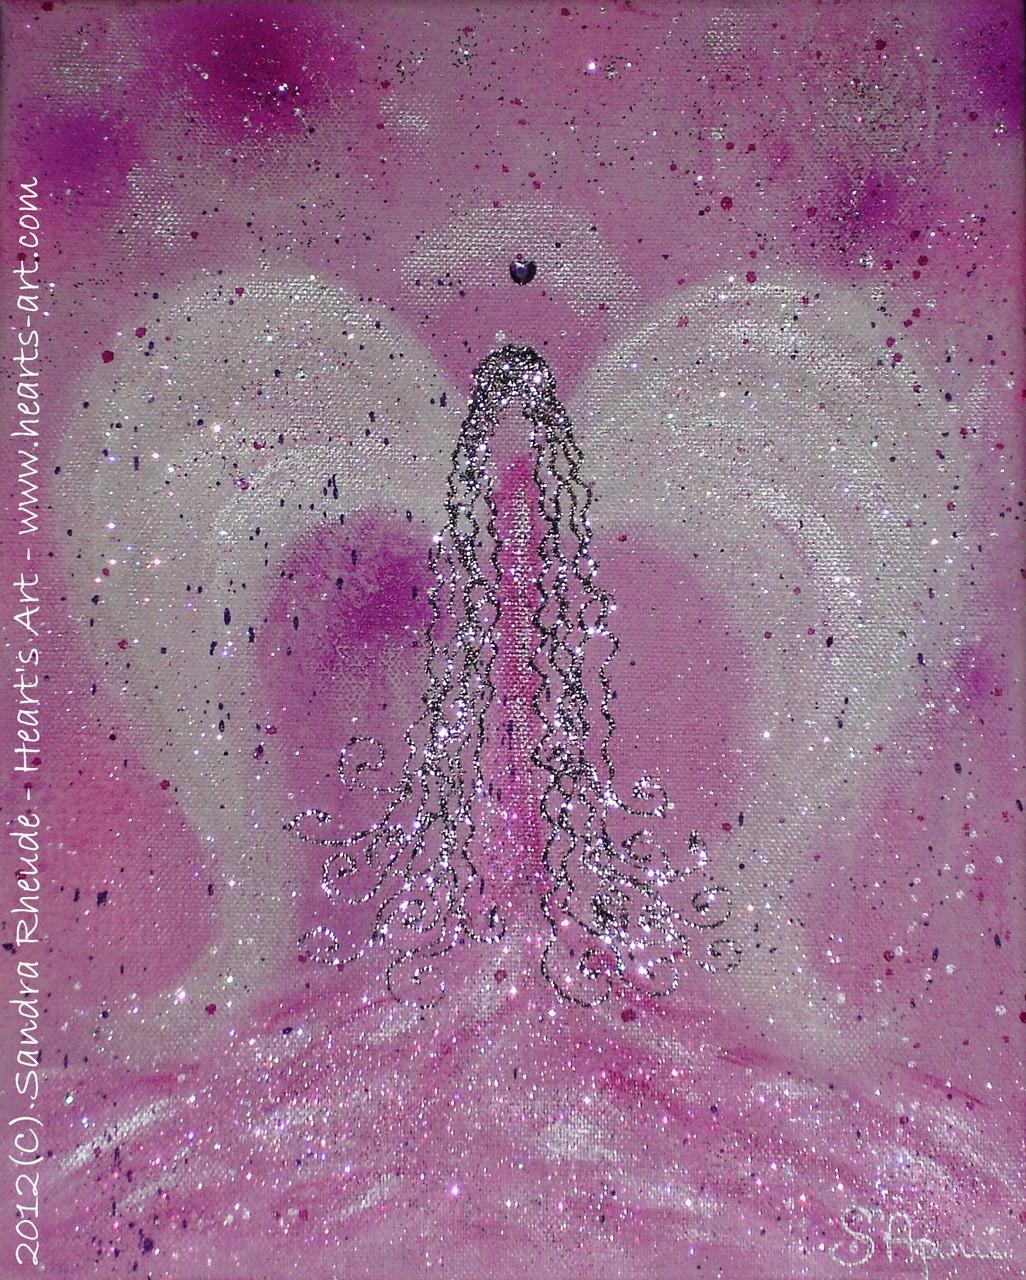 Kinder-Schutzengel 'Hearty' - 2012/49 - Acryl auf Leinwand - 24 x 30 cm - verkauft